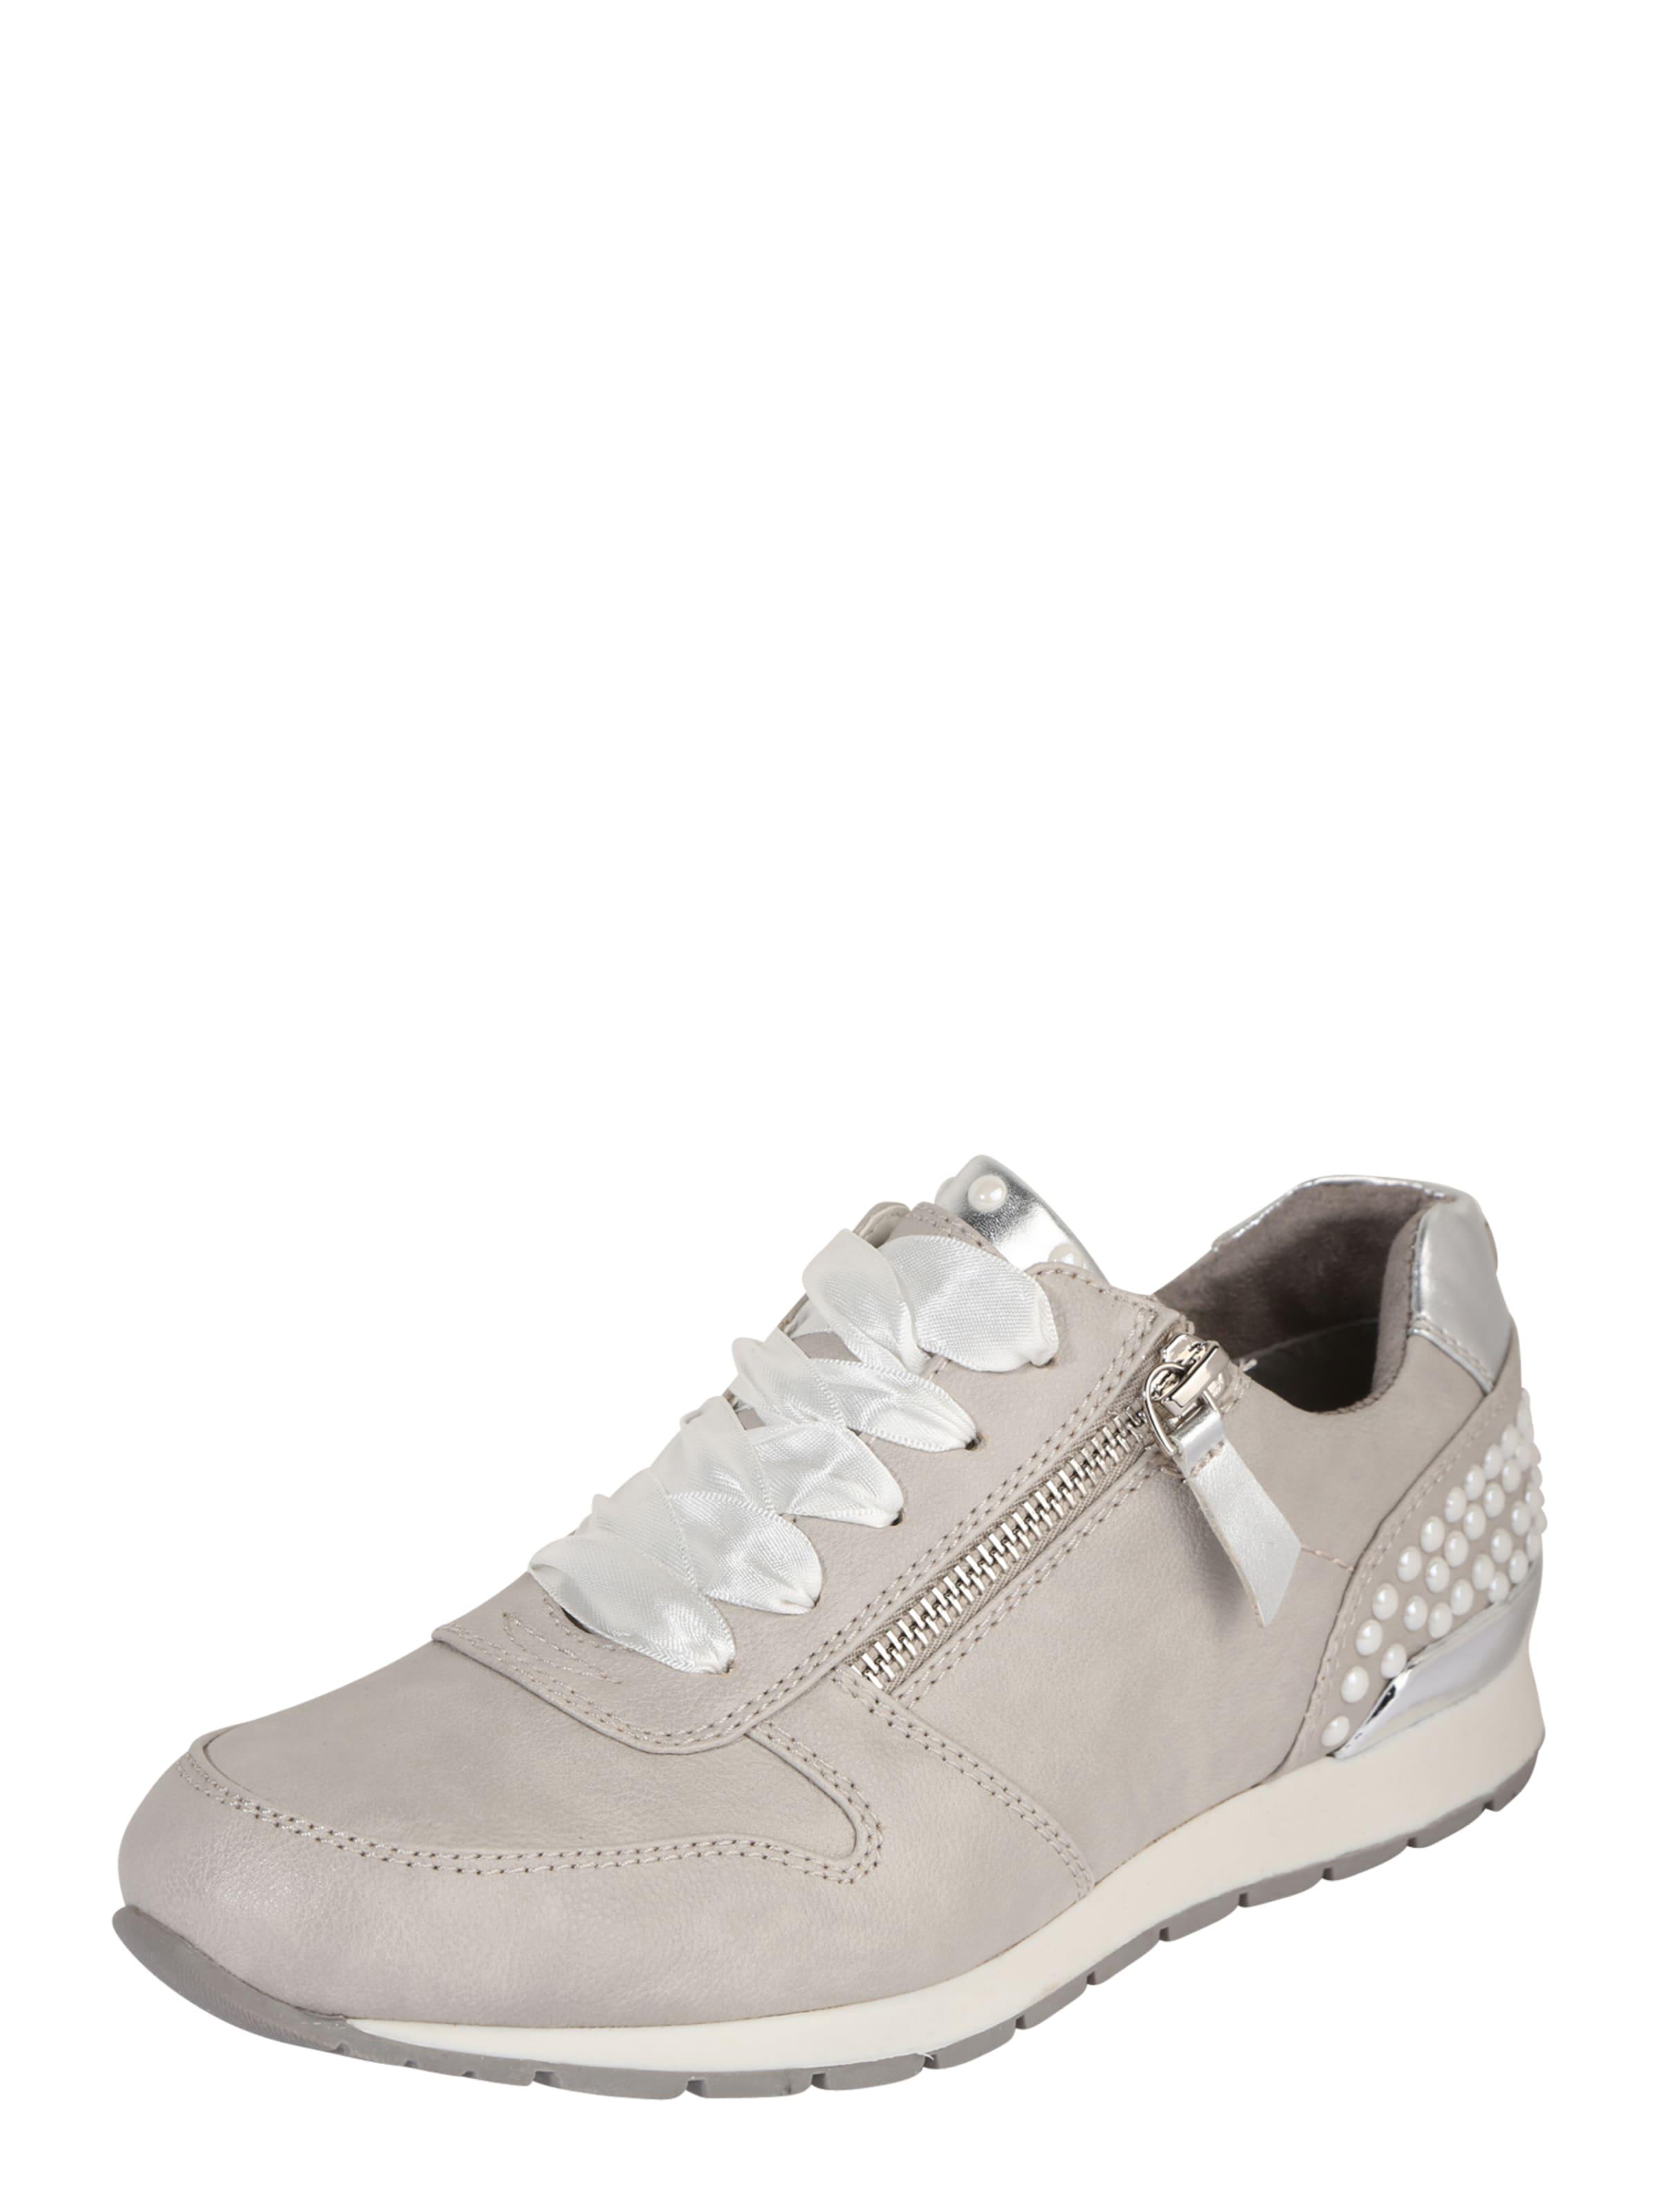 Haltbare Mode billige Gut Schuhe TOM TAILOR   Sneaker Schuhe Gut billige getragene Schuhe b3af01